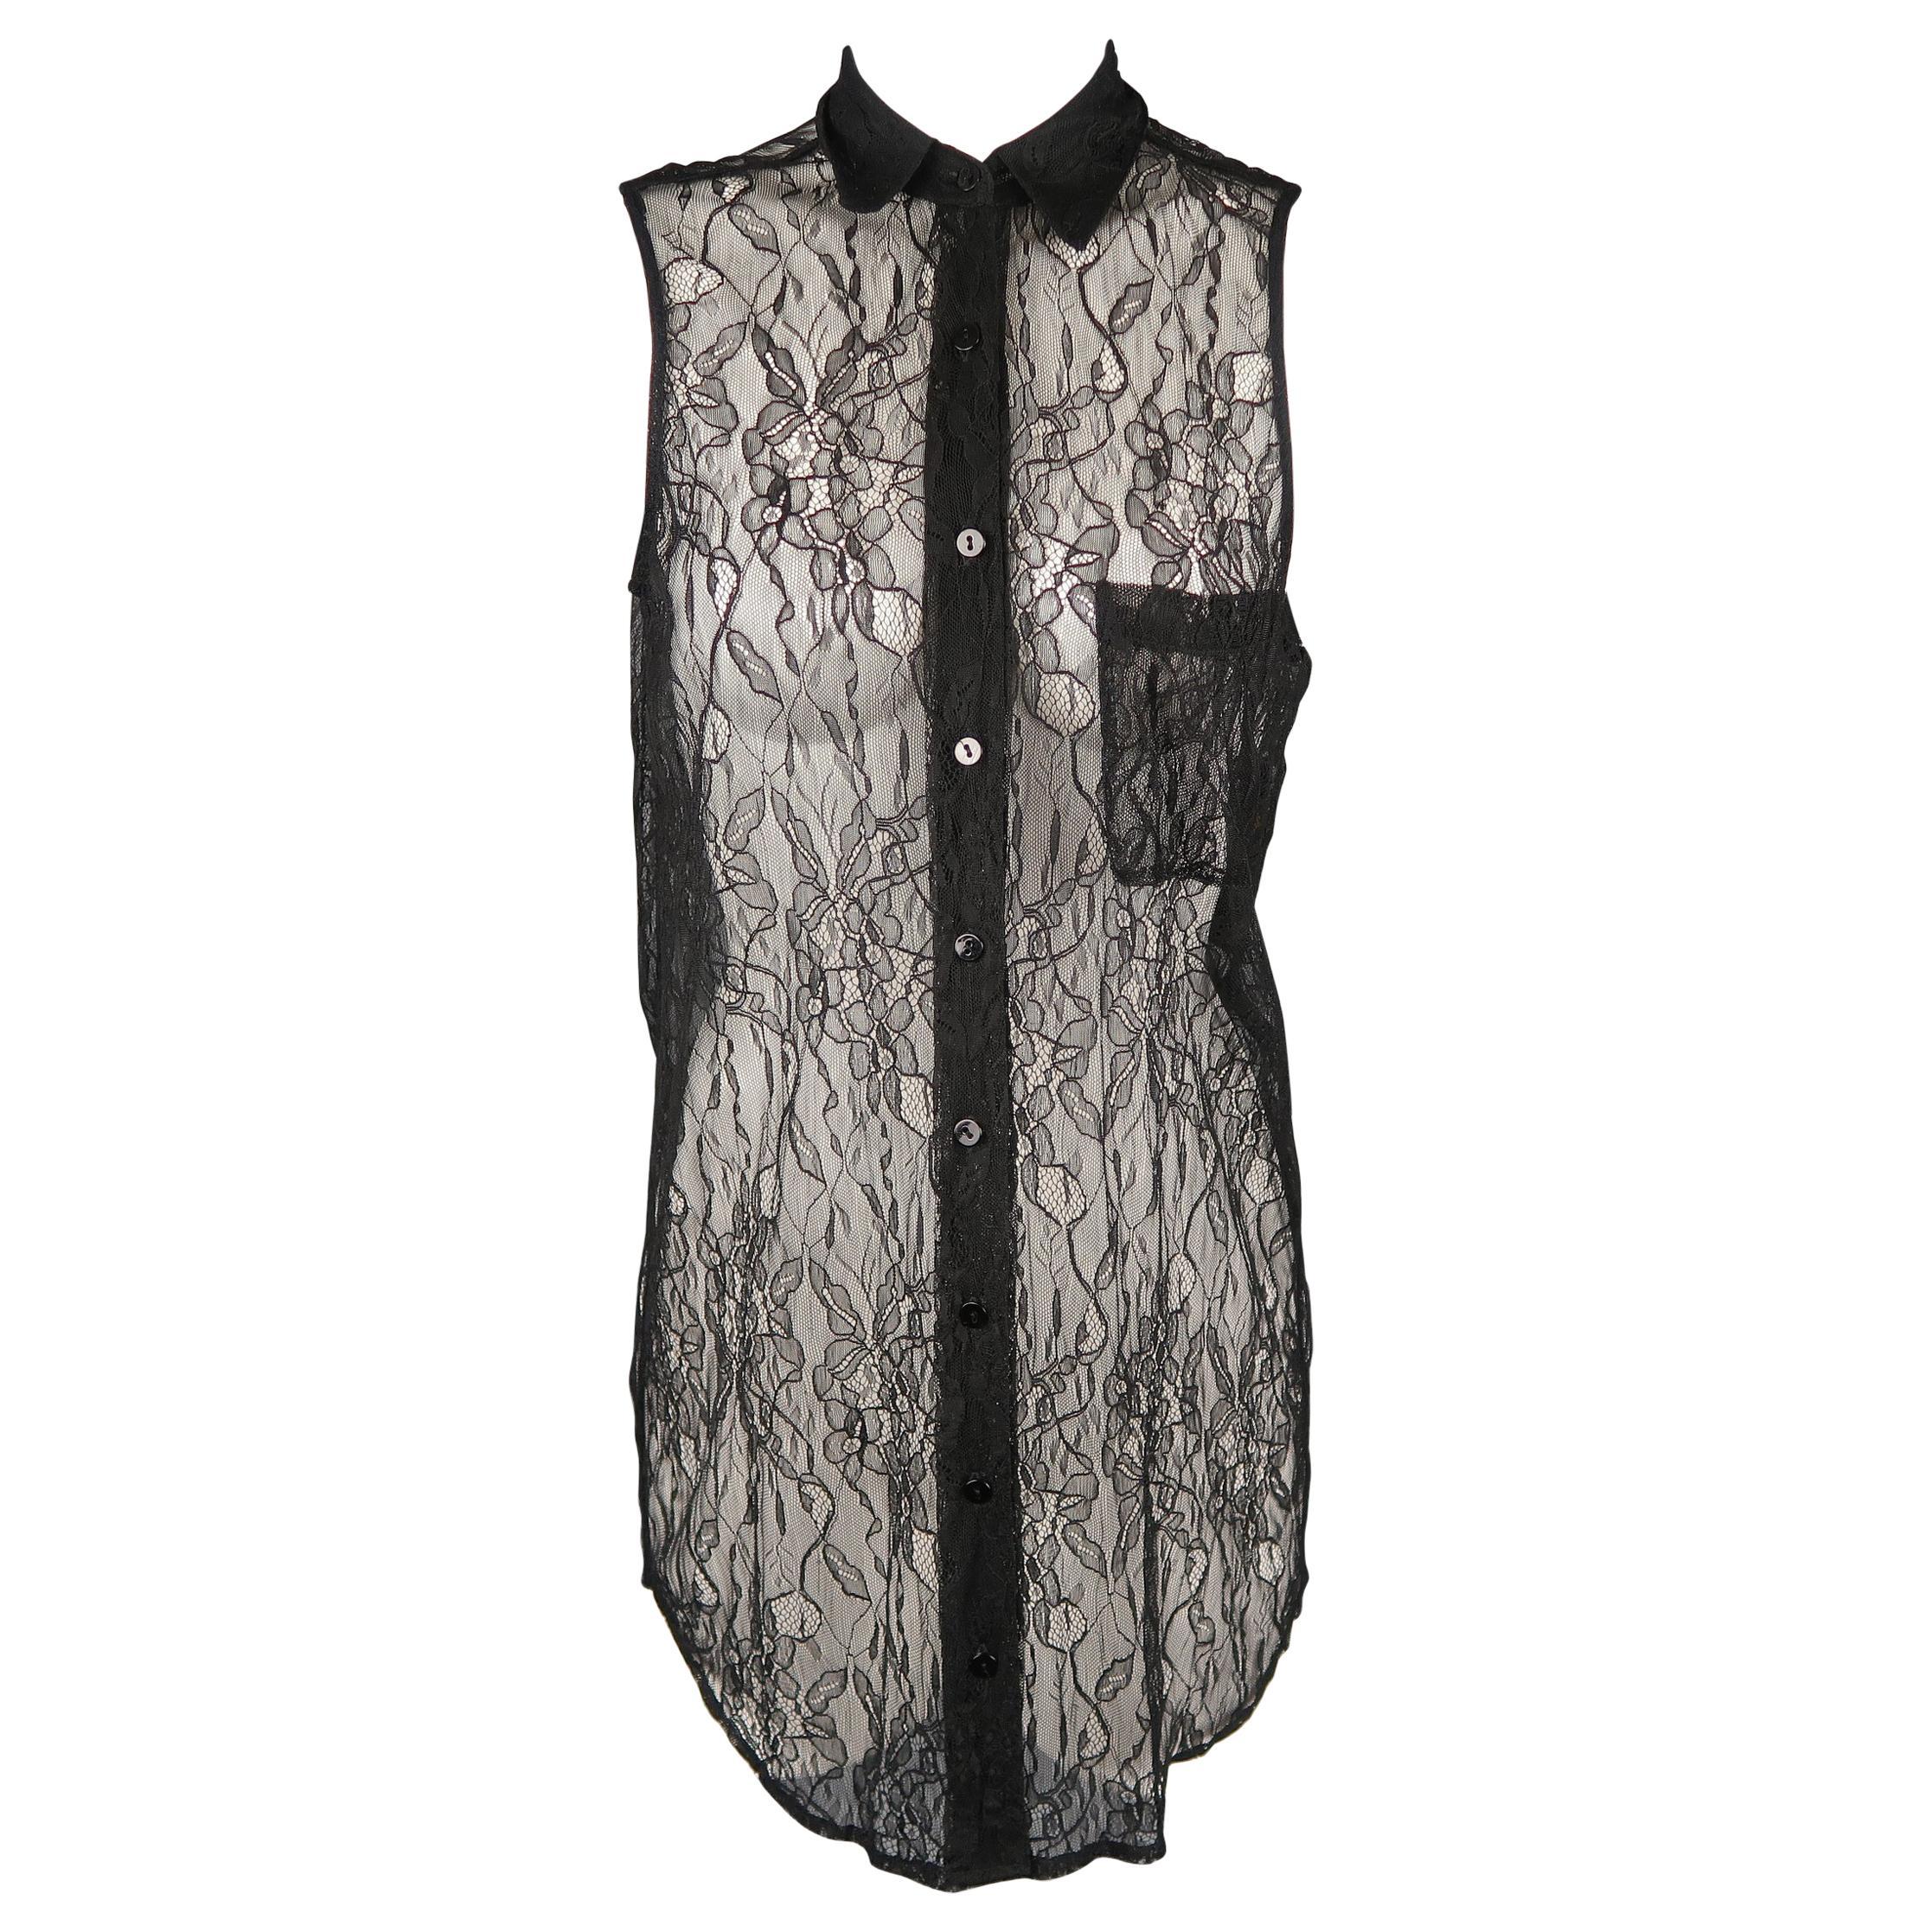 Equipment Femme Size Xs Black Lace Sleeveless Collared Shirt Blouse